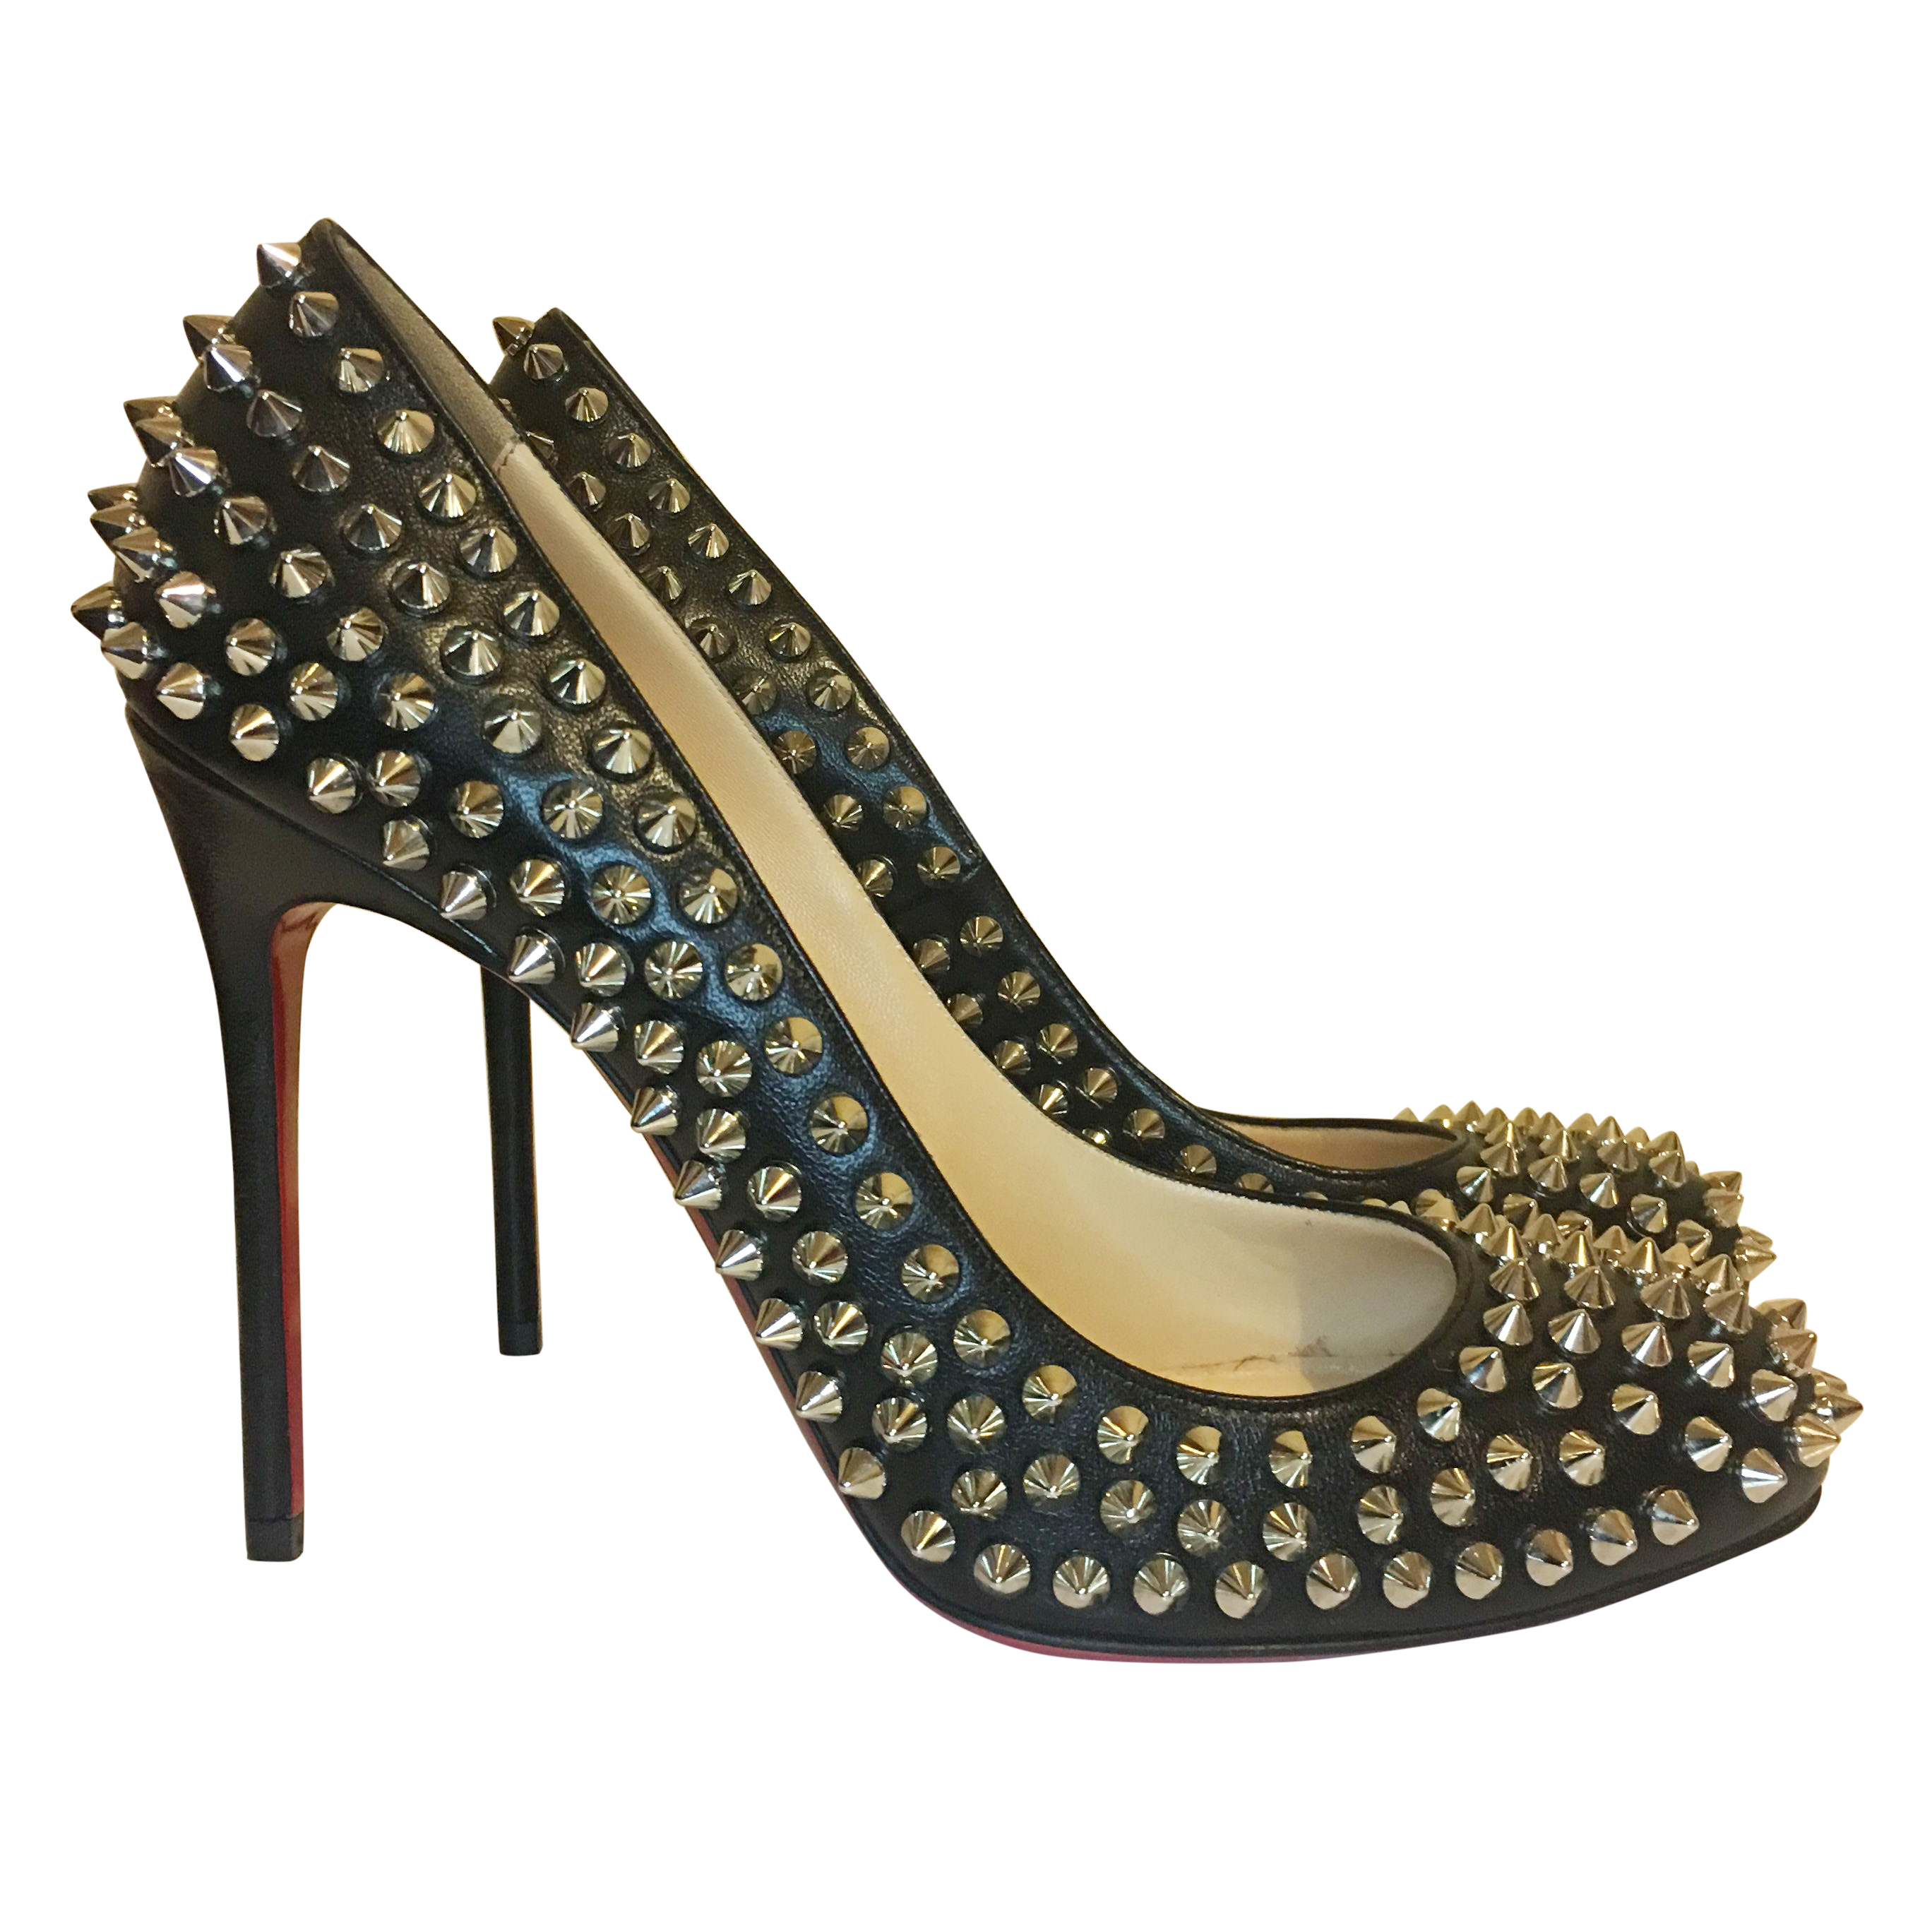 new concept 669bf a8eb8 Christian Louboutin Fifi Spike heels 100 mm